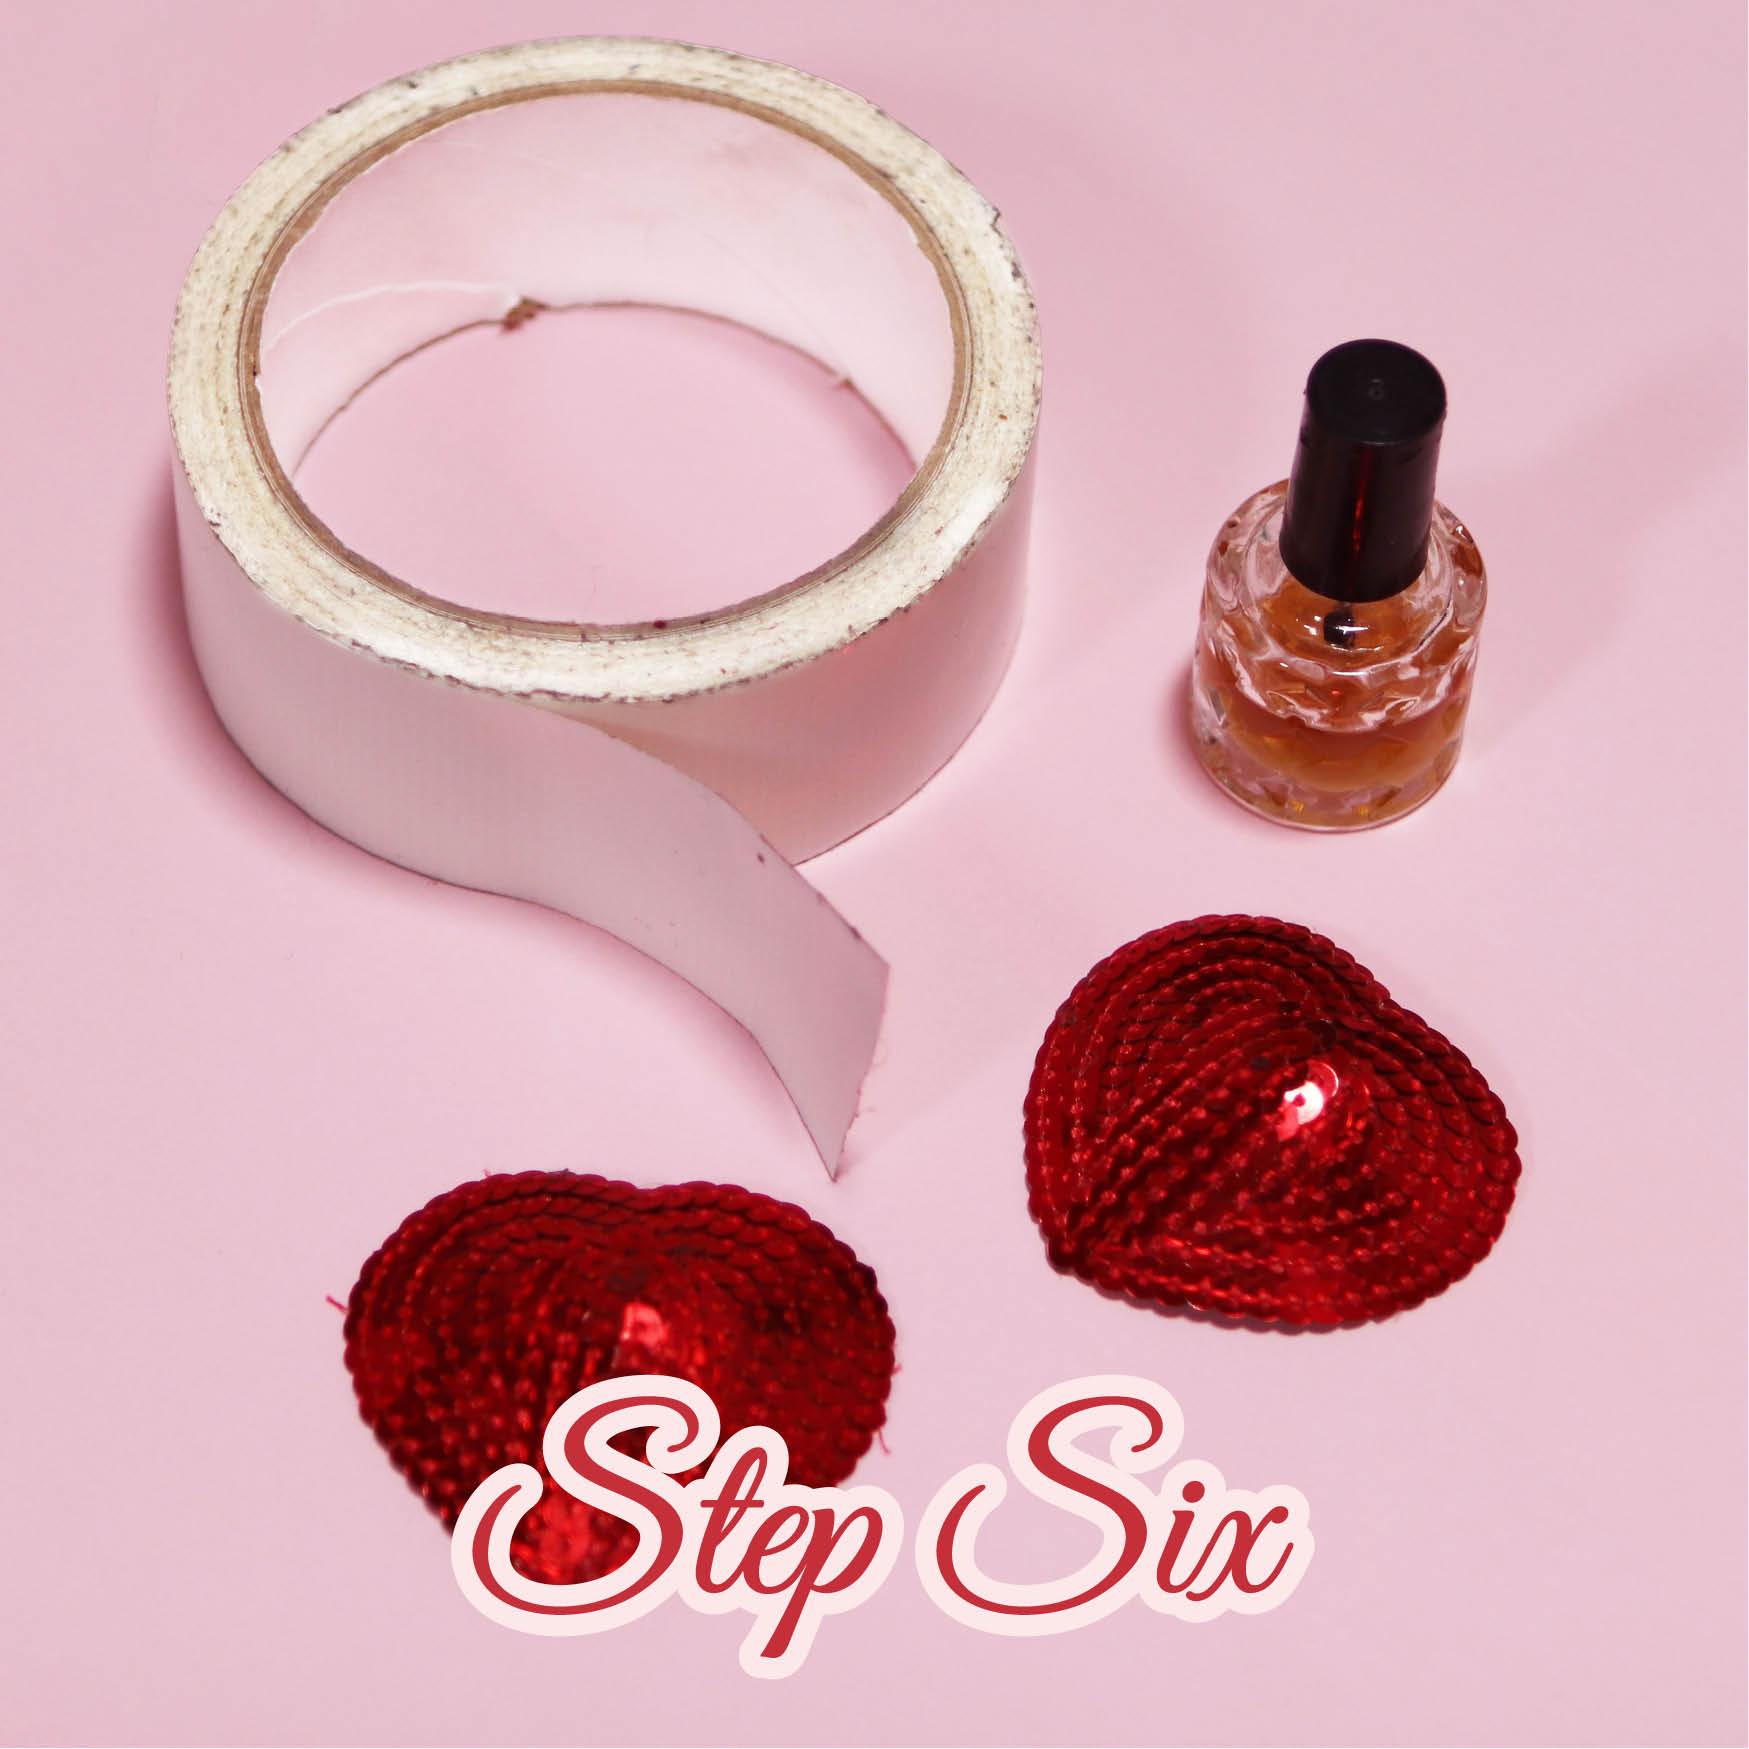 Step-Six.jpg